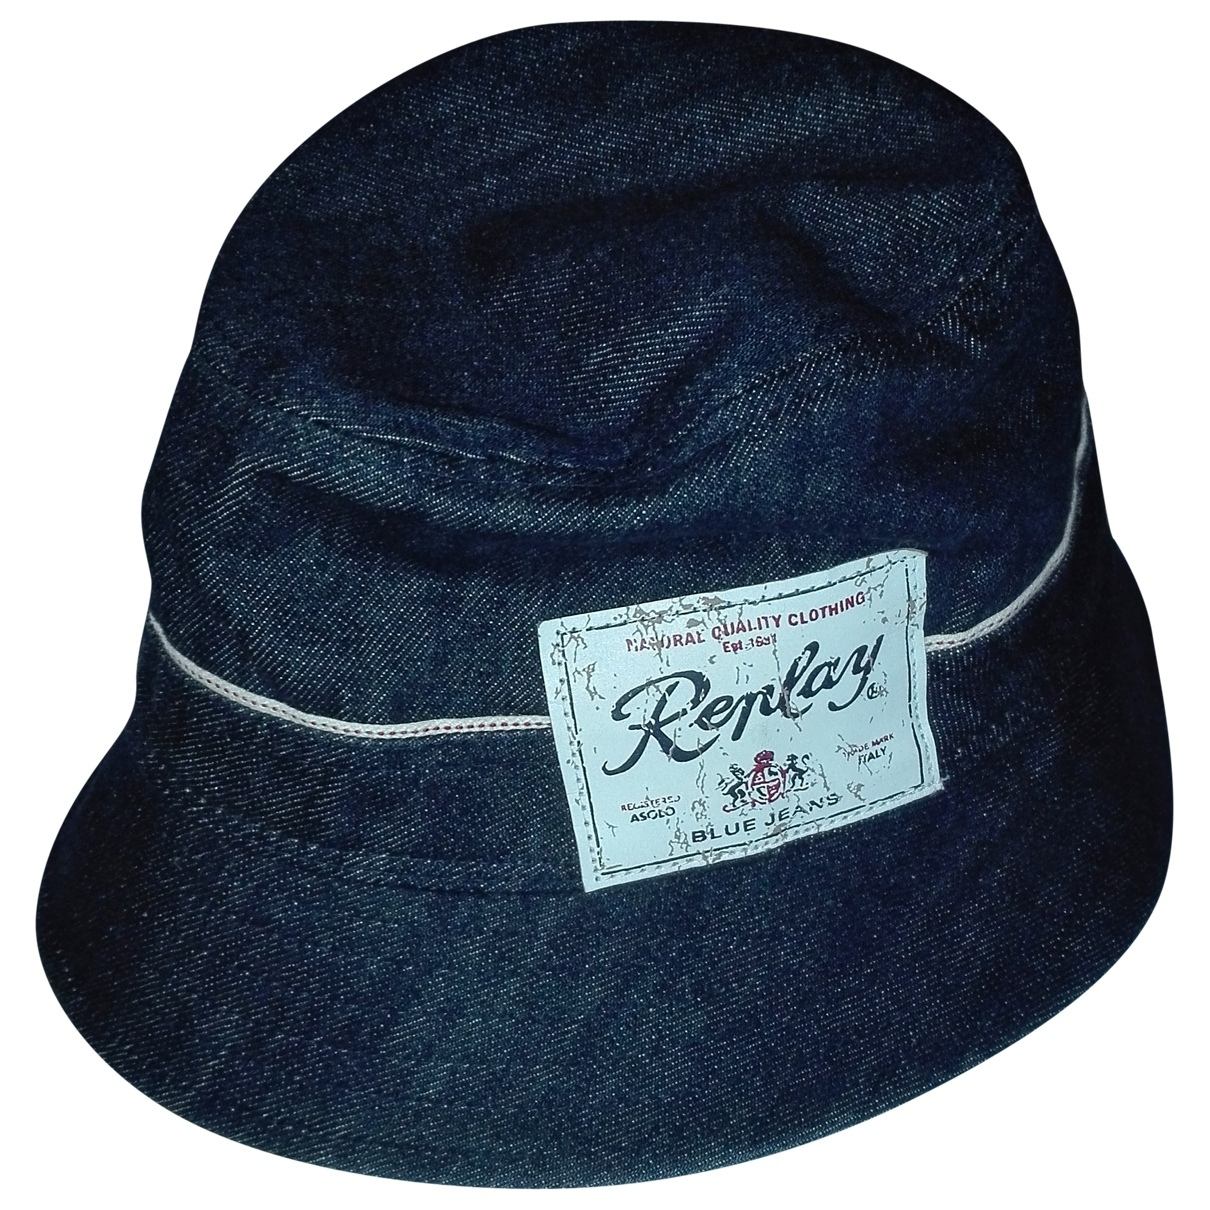 Replay \N Hut, Muetzen, Handschuhe in  Blau Baumwolle